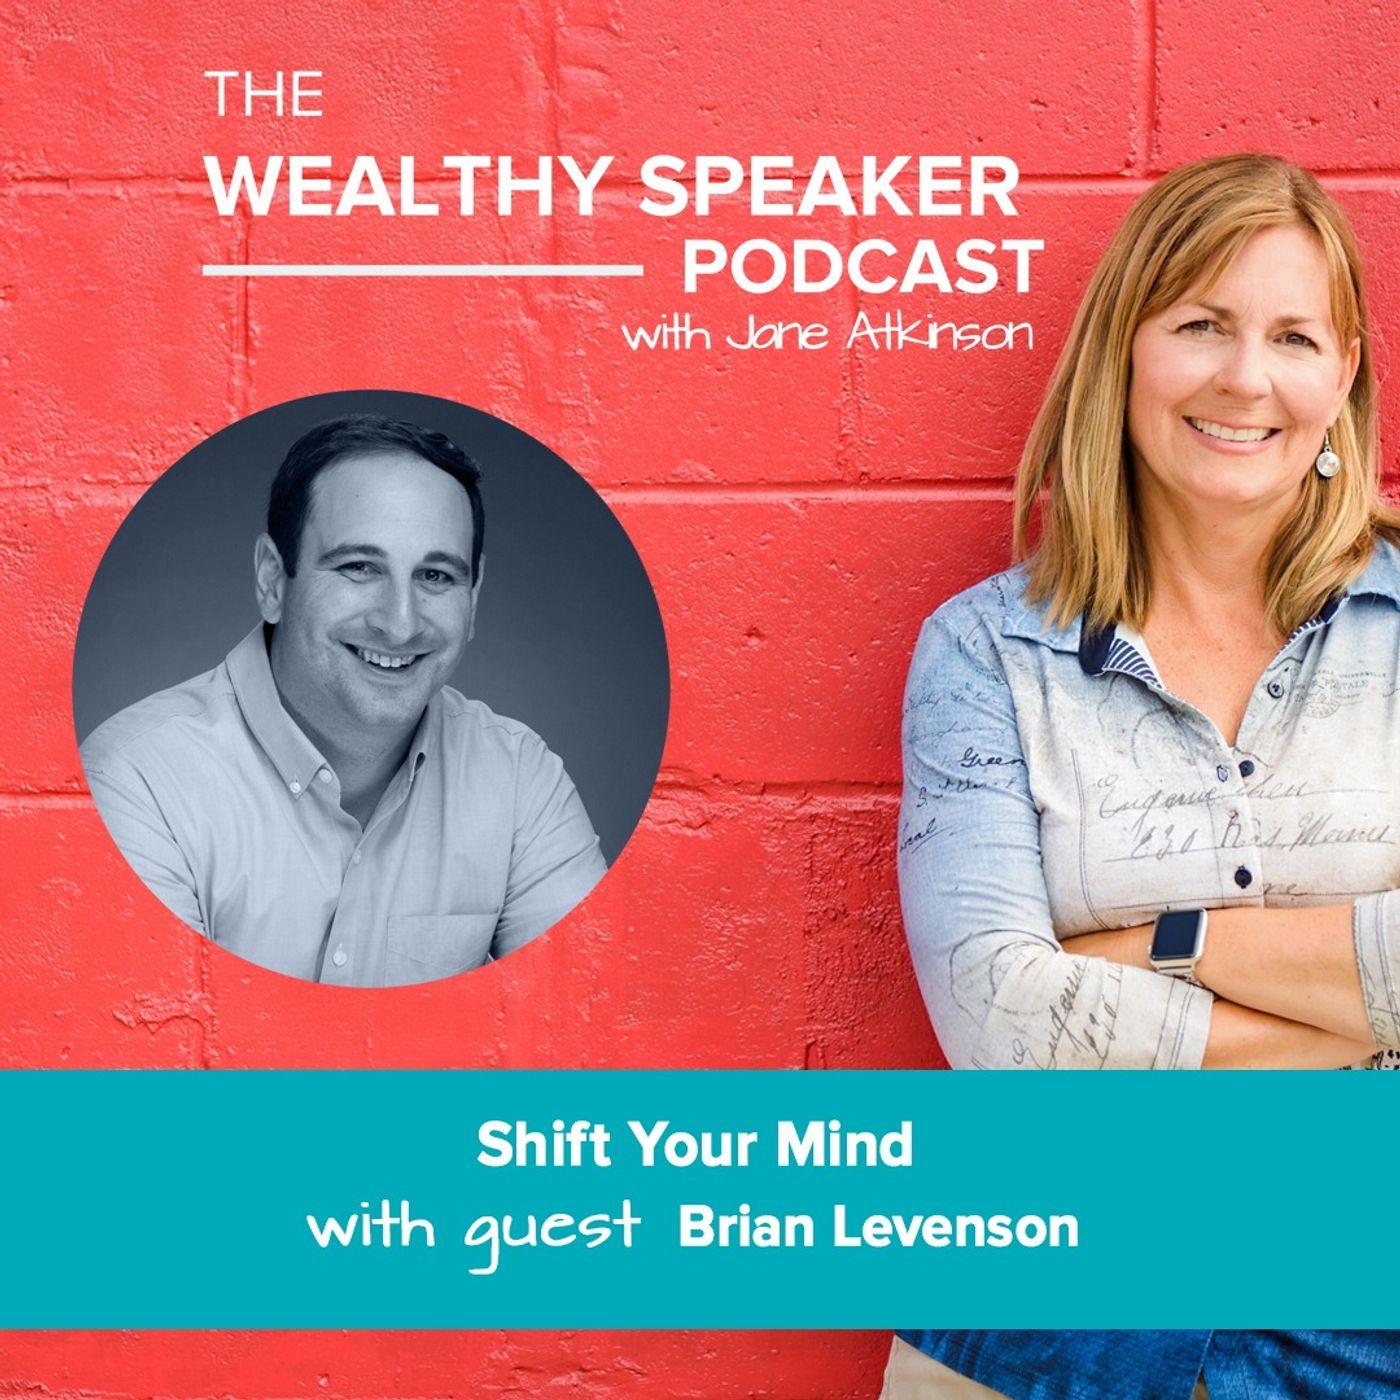 Jane Atkinson and Brian Levenson discuss mindset